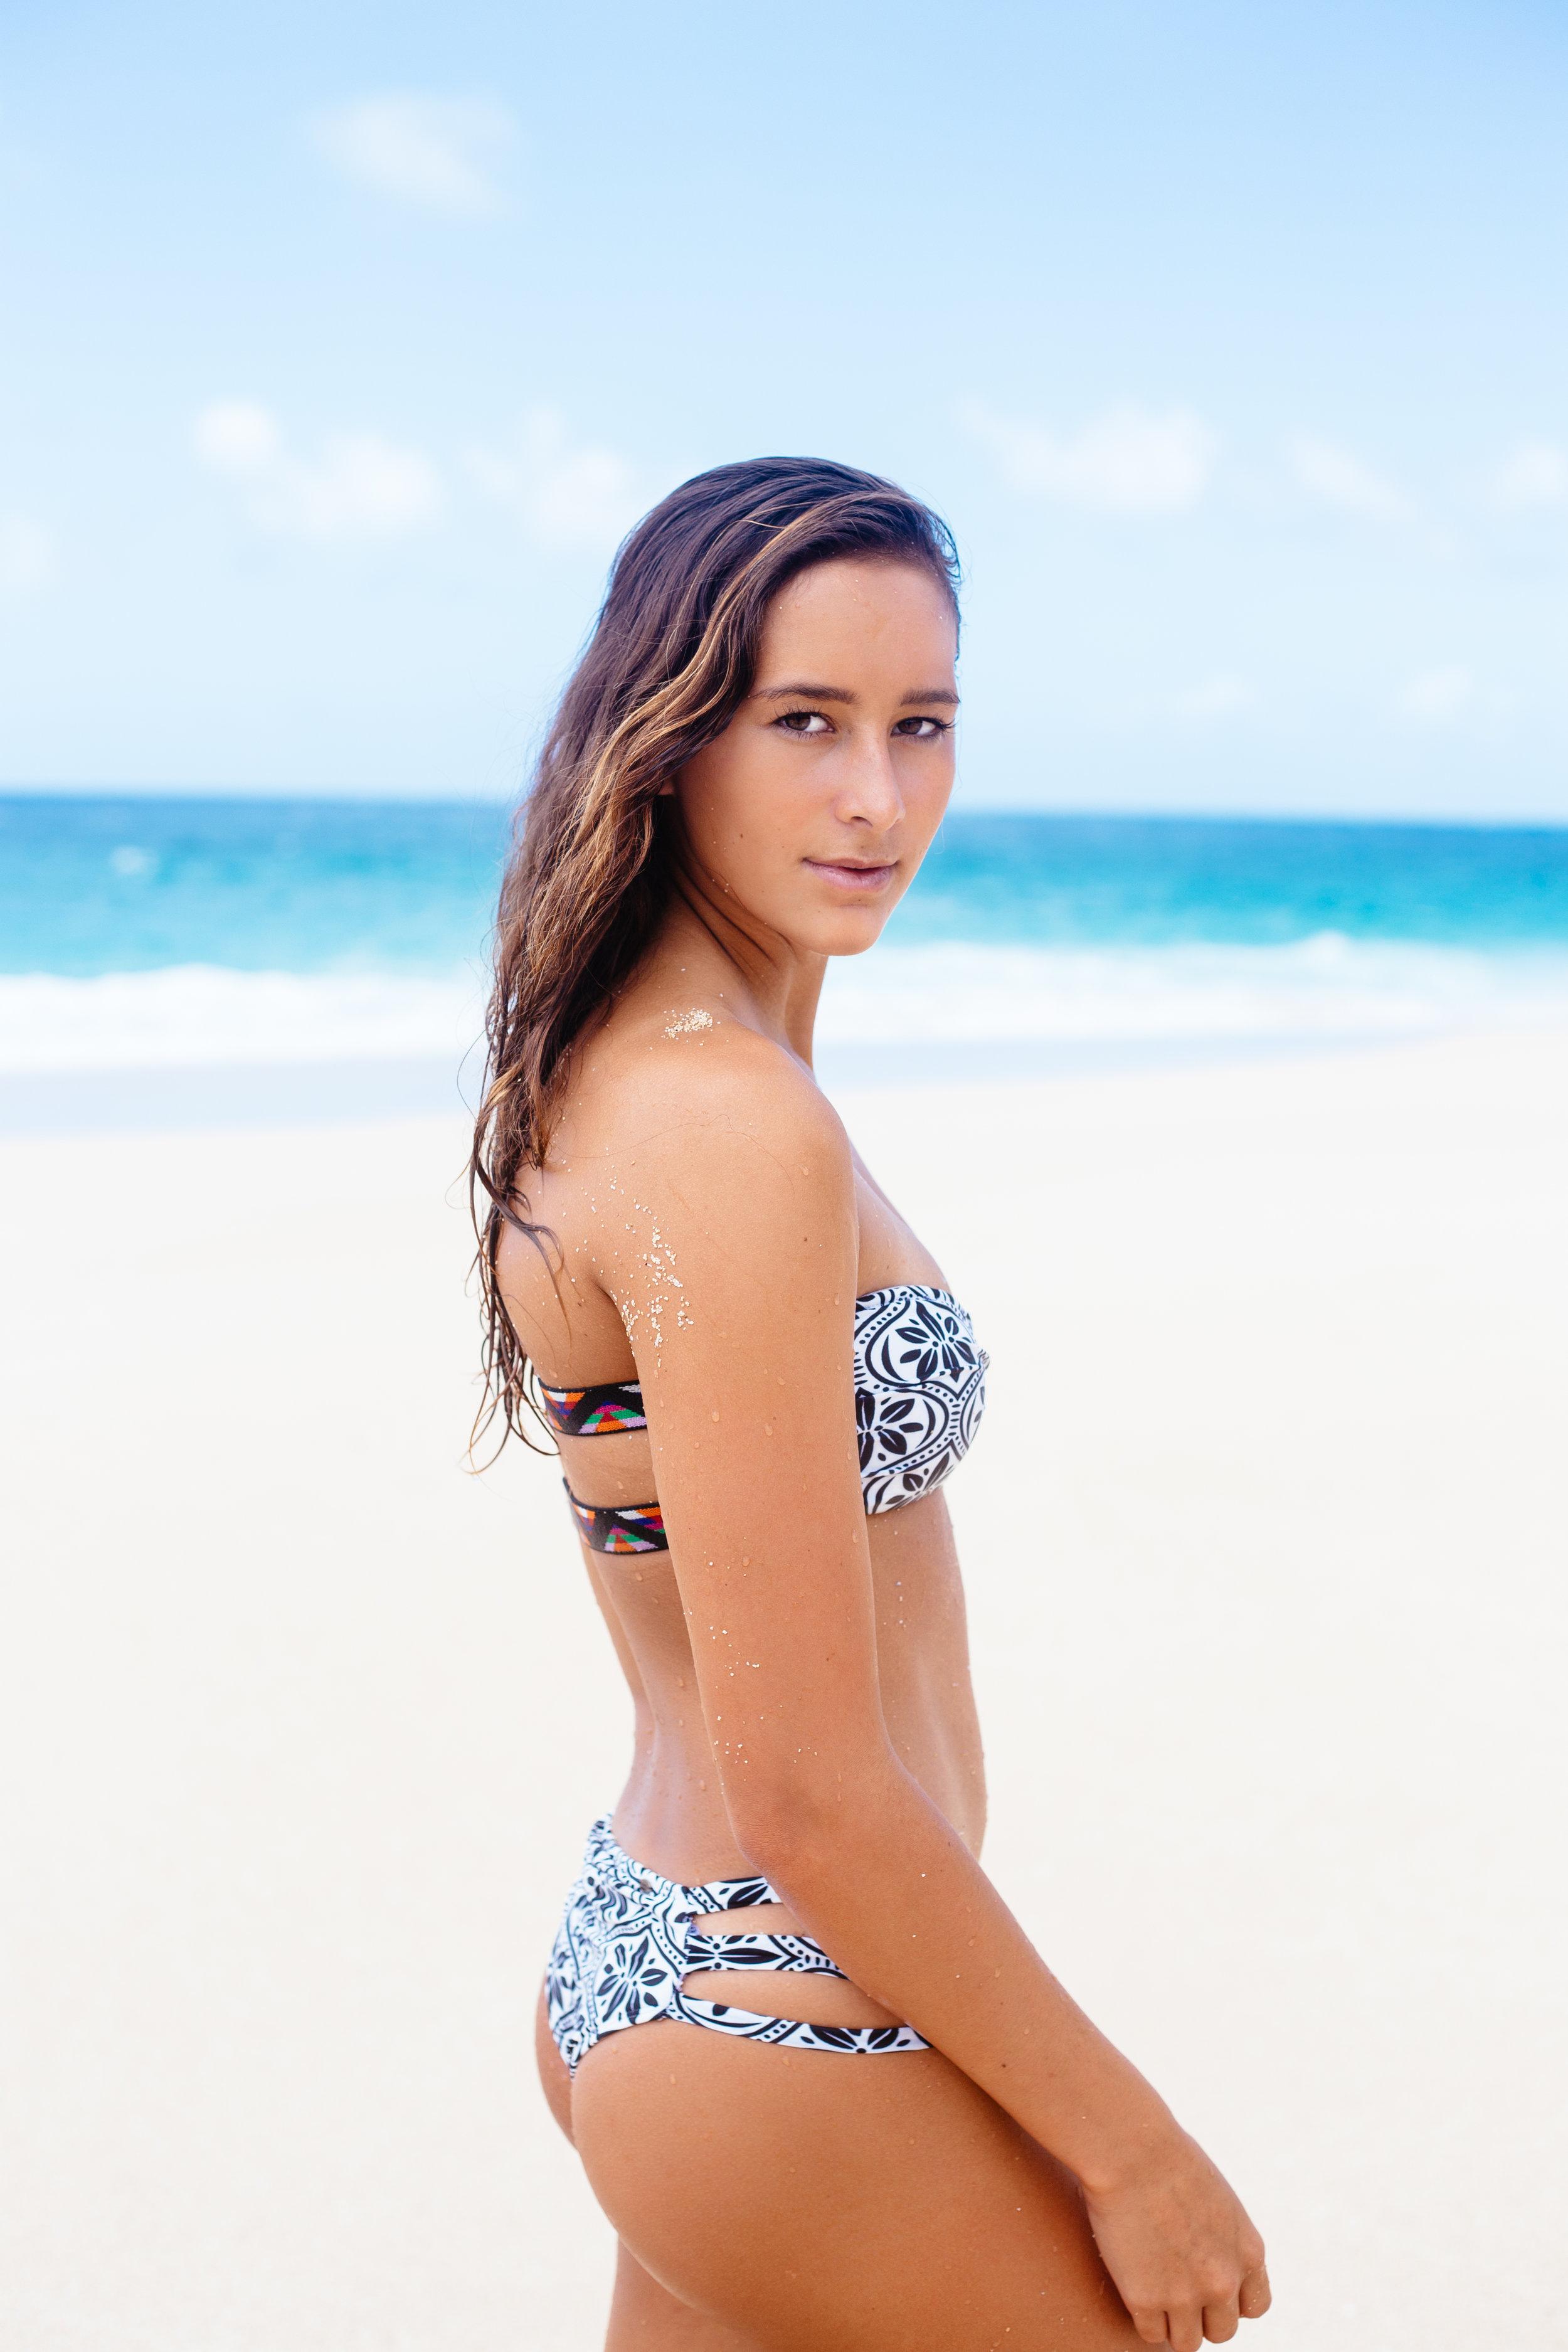 Honolua Blomfield - O'Neill Women's Surfer - AROSE TRAVELS